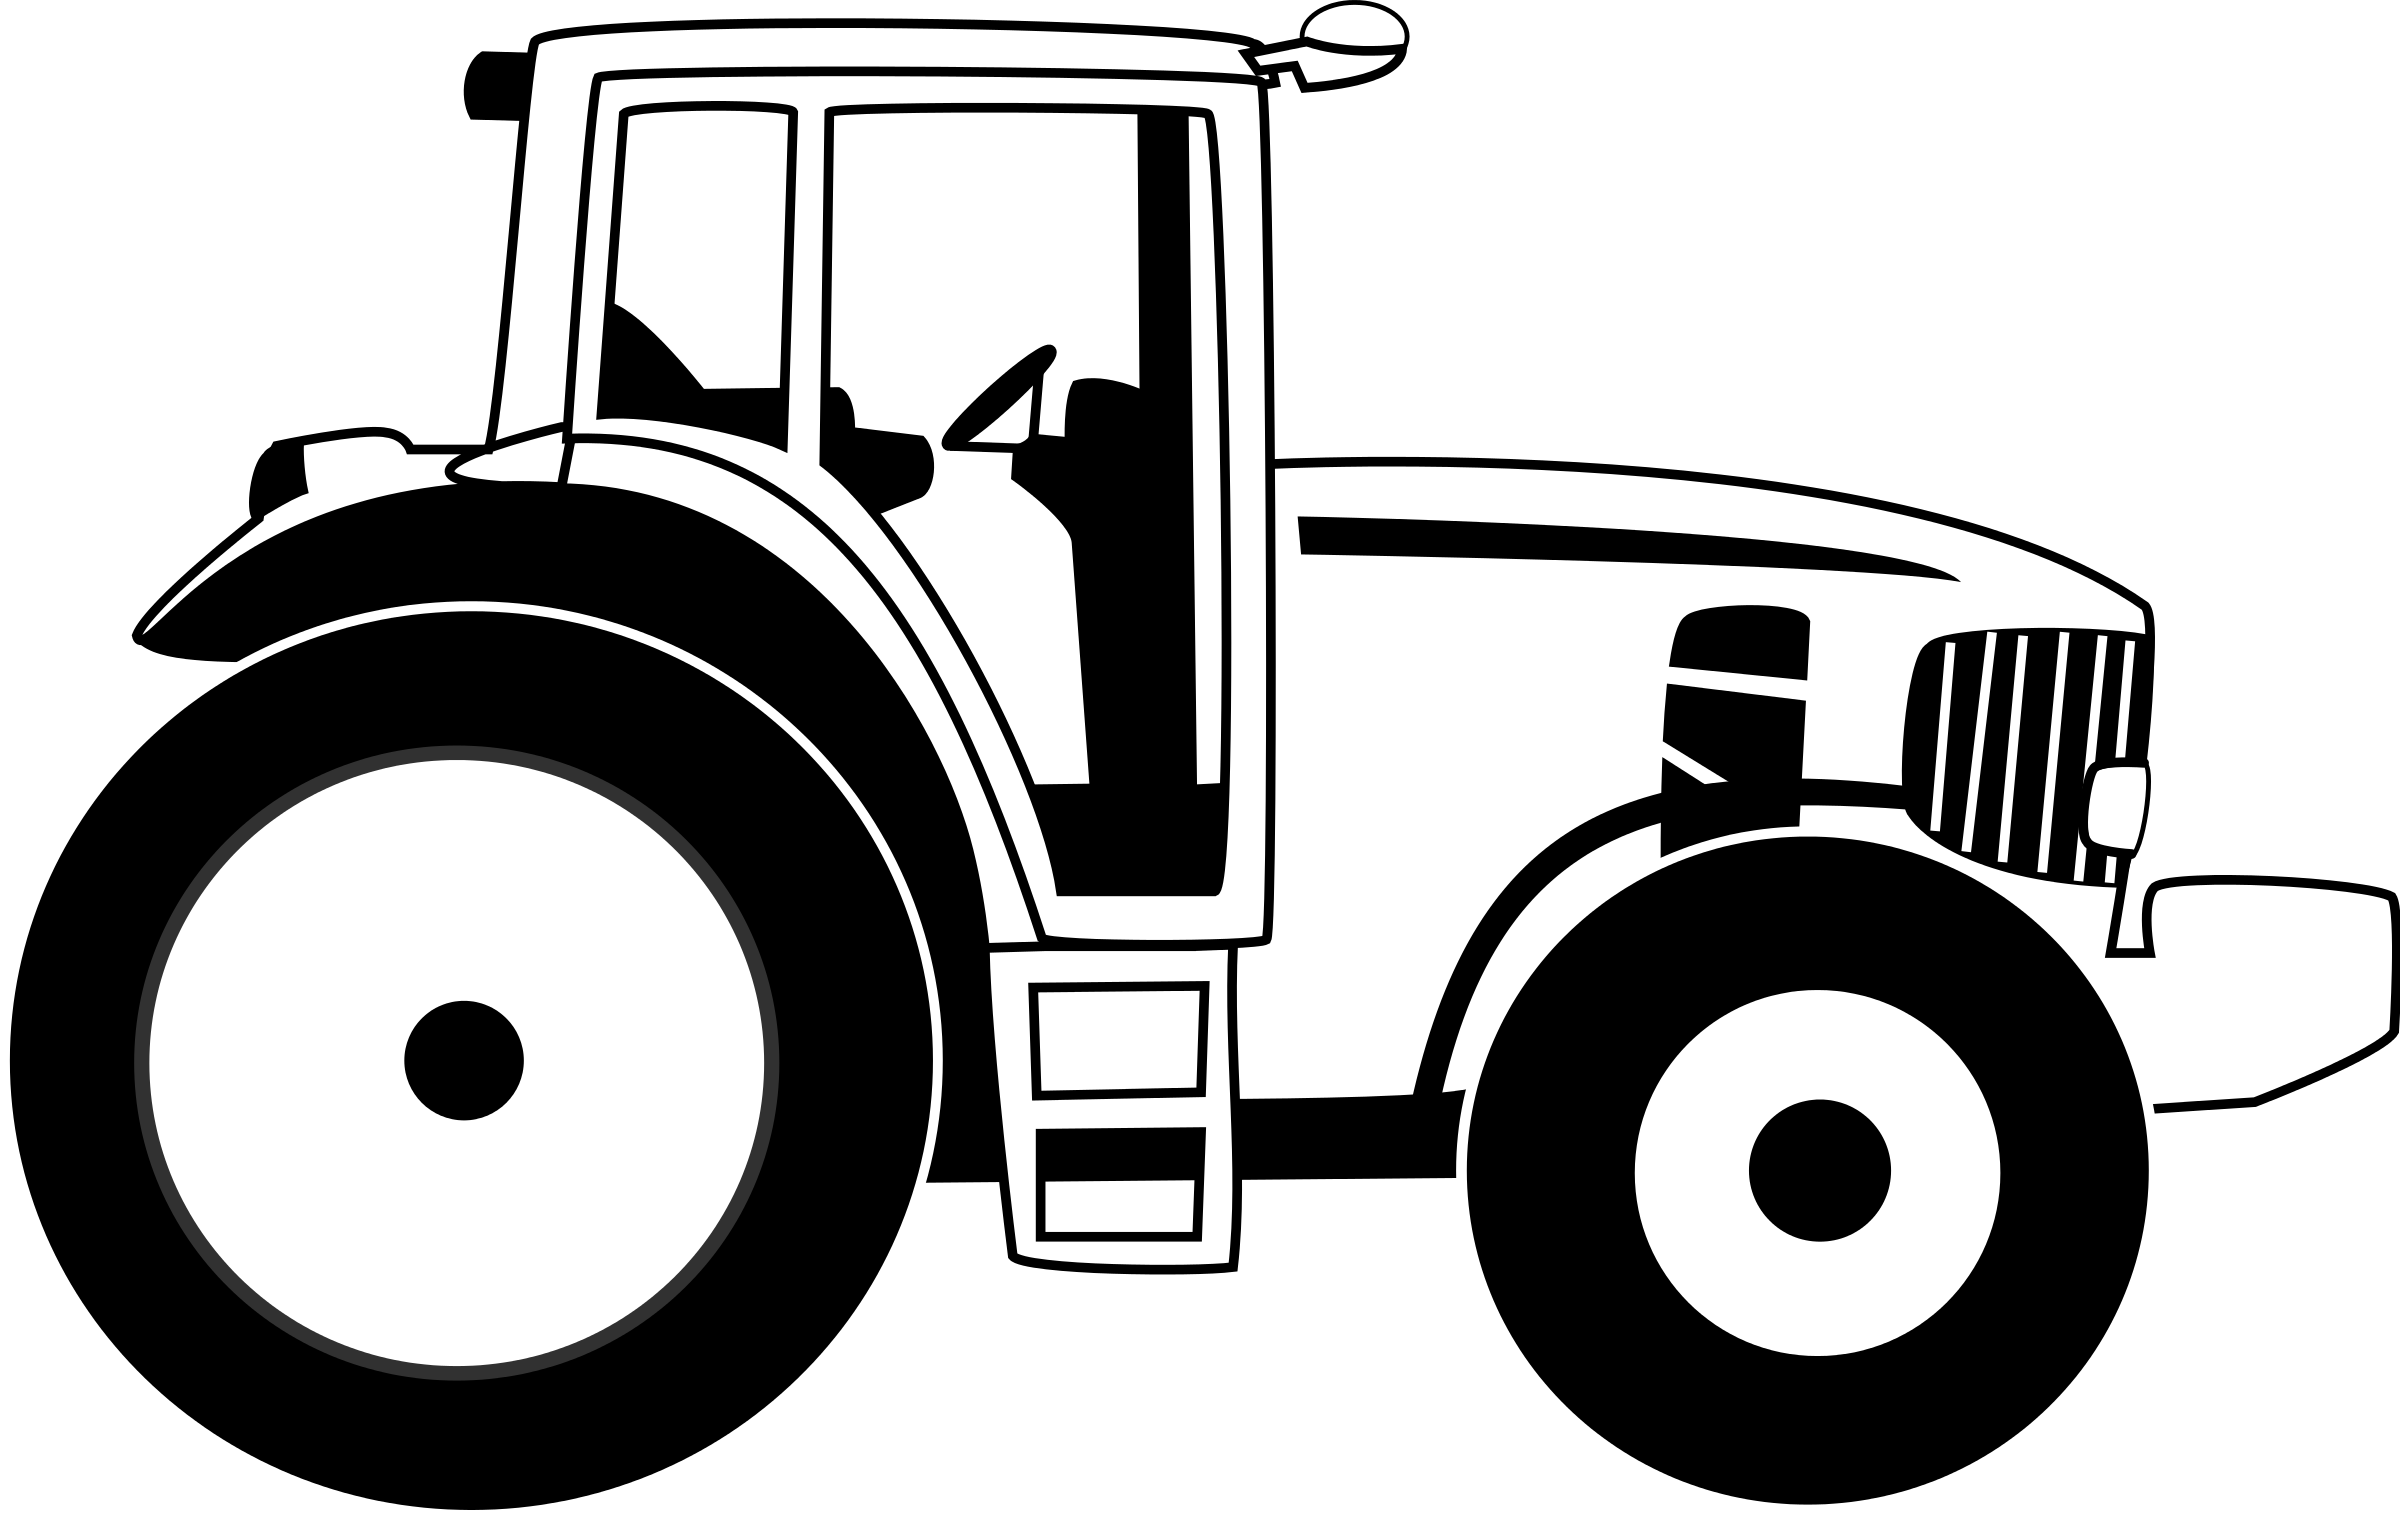 Semi Truck Clipart Black And White | Free download best Semi